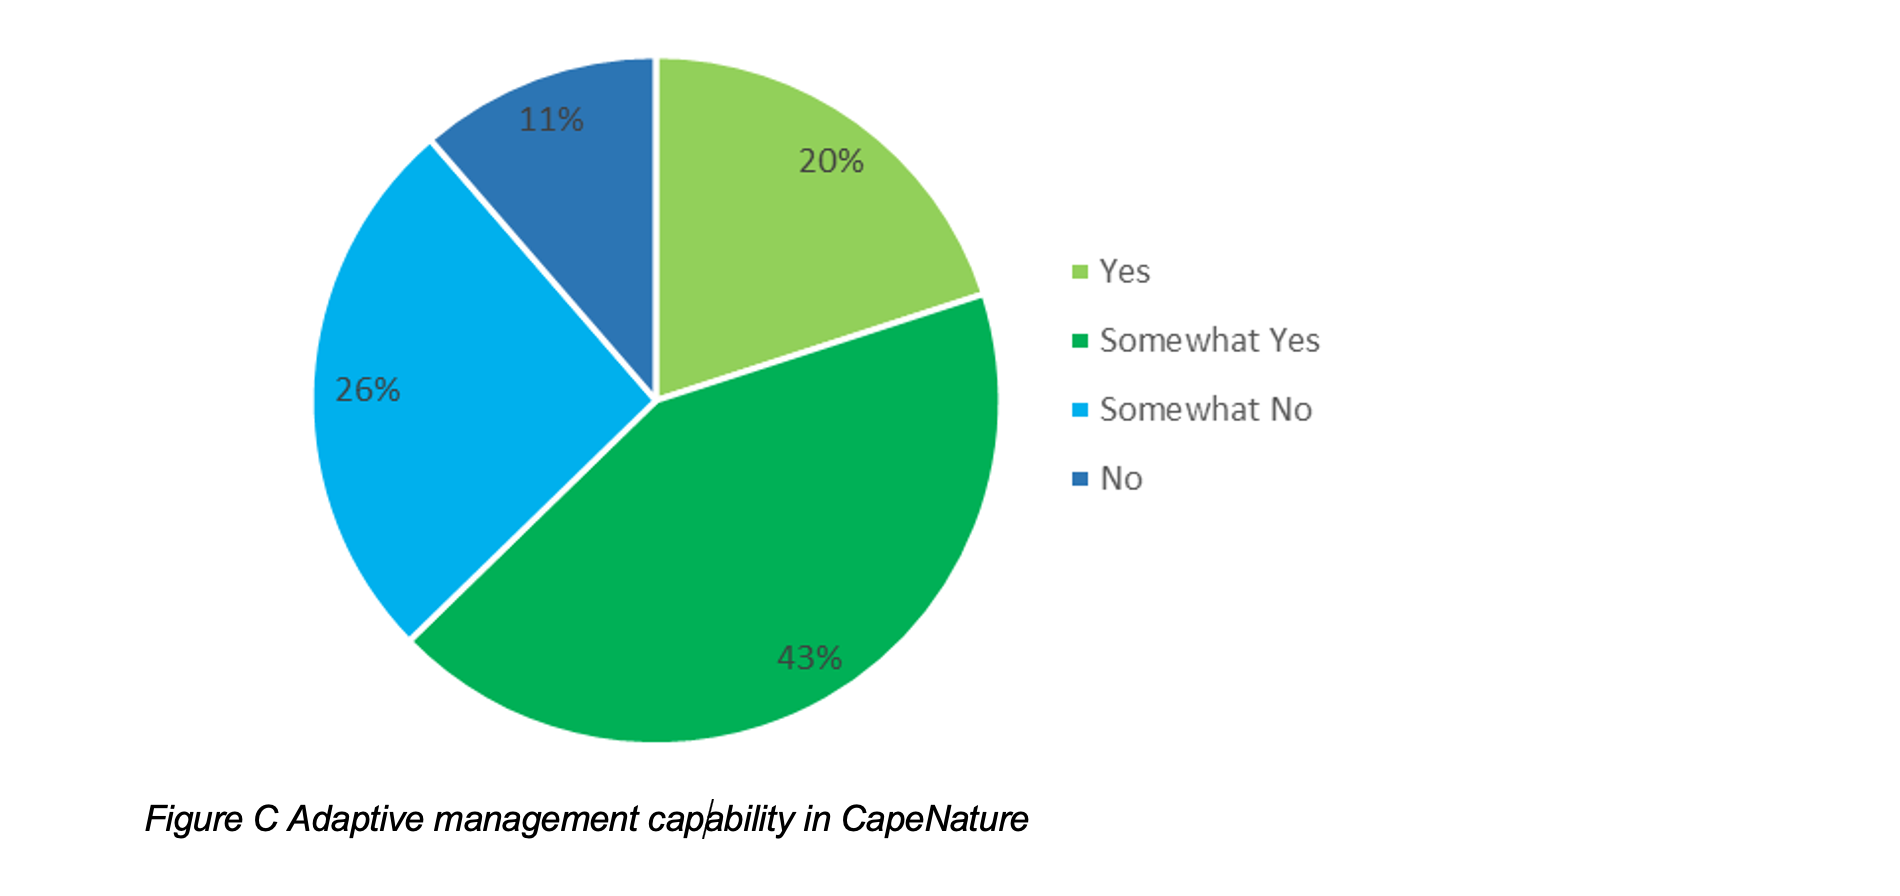 Figure C Adaptive management capability in CapeNature